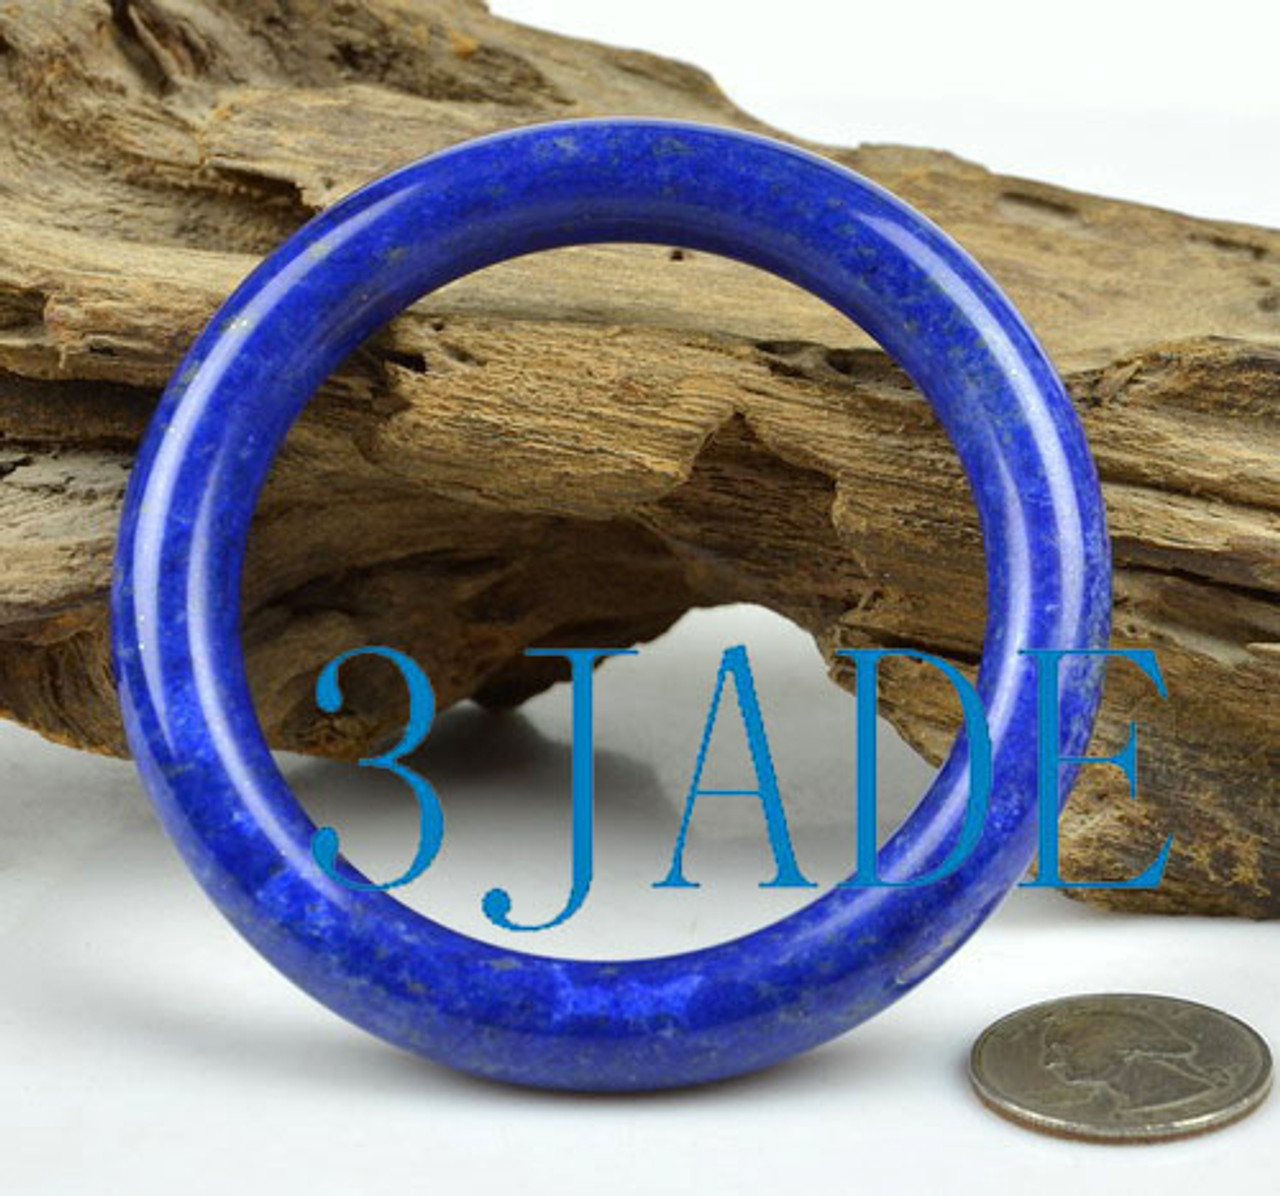 59.5mm bangle